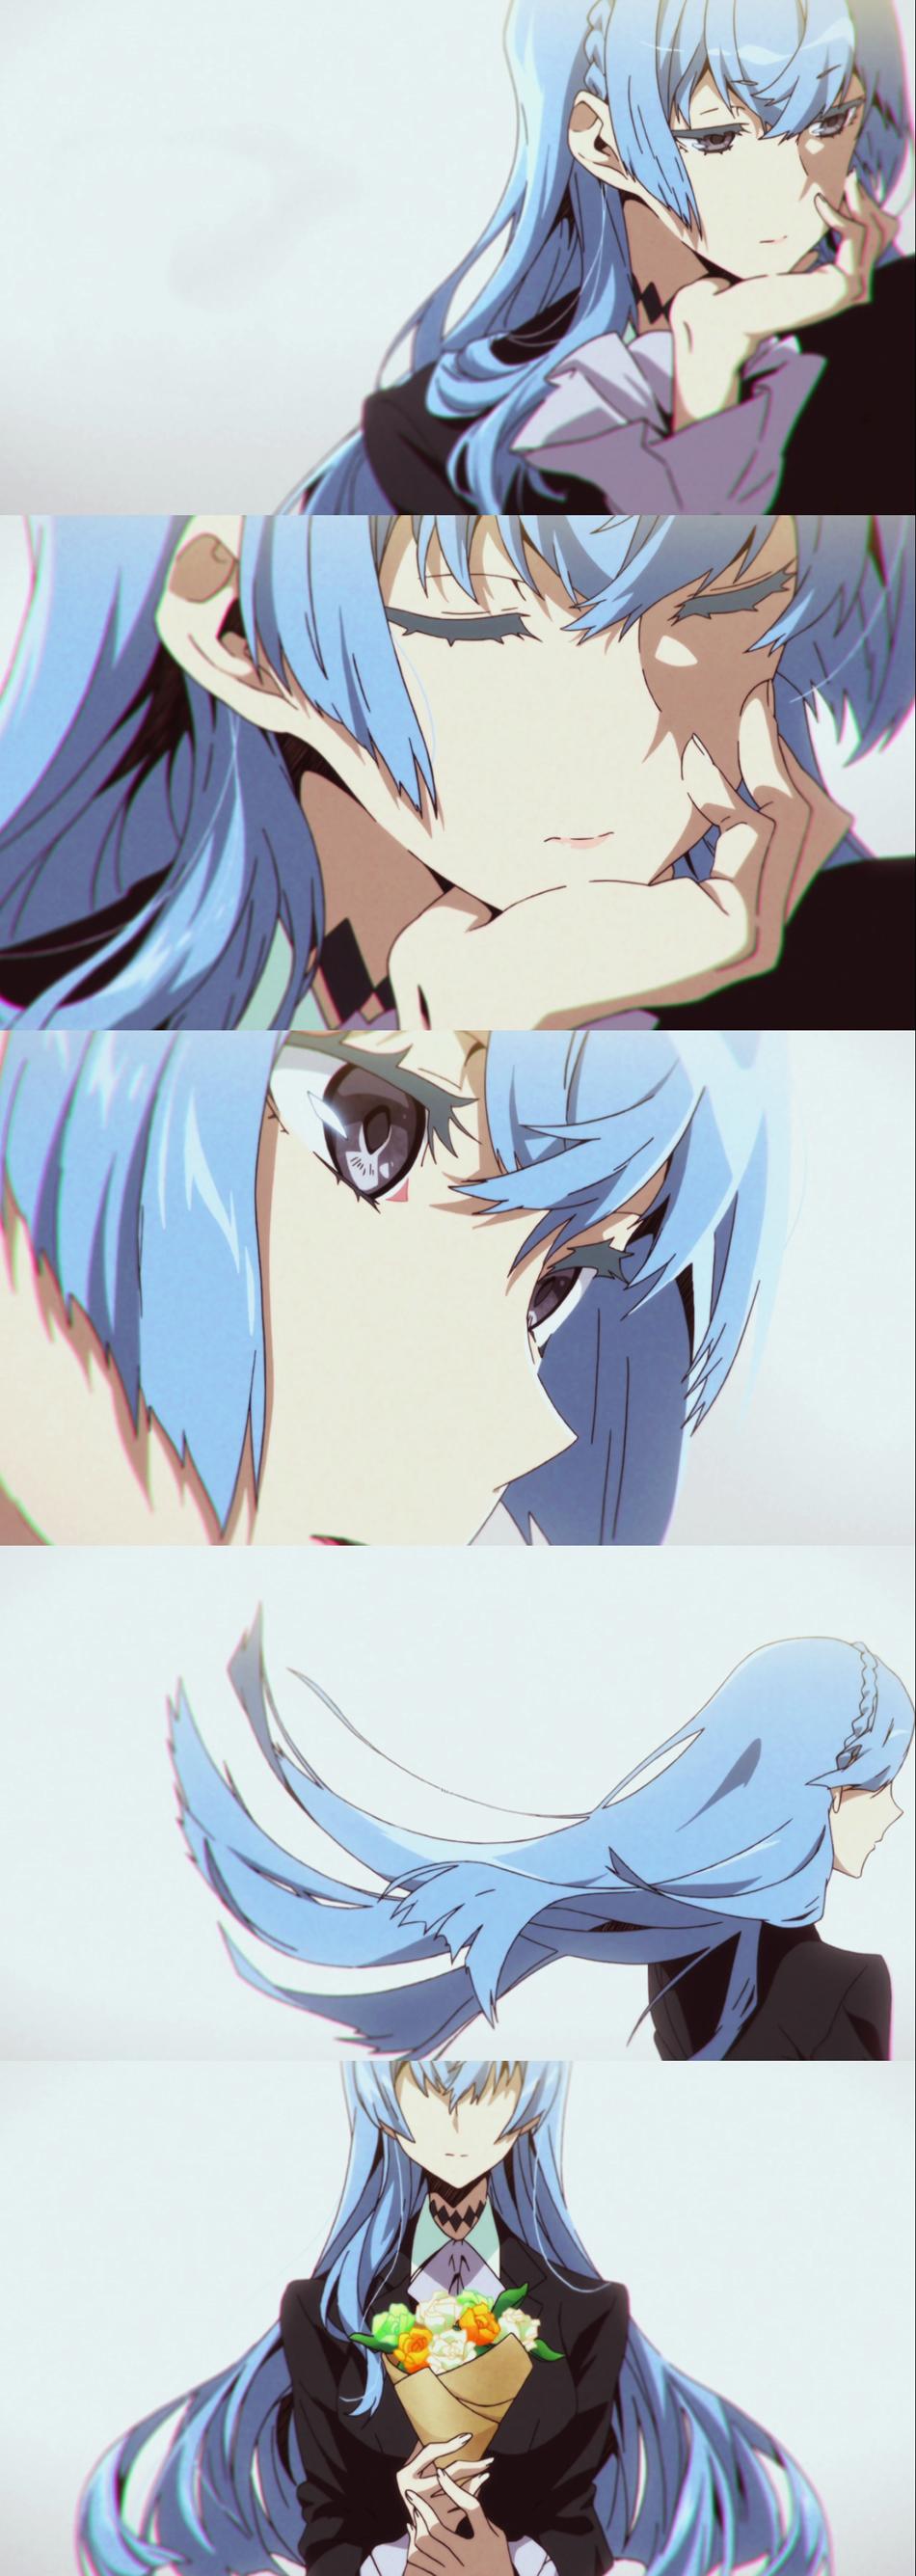 flirting games anime girls 2016 season